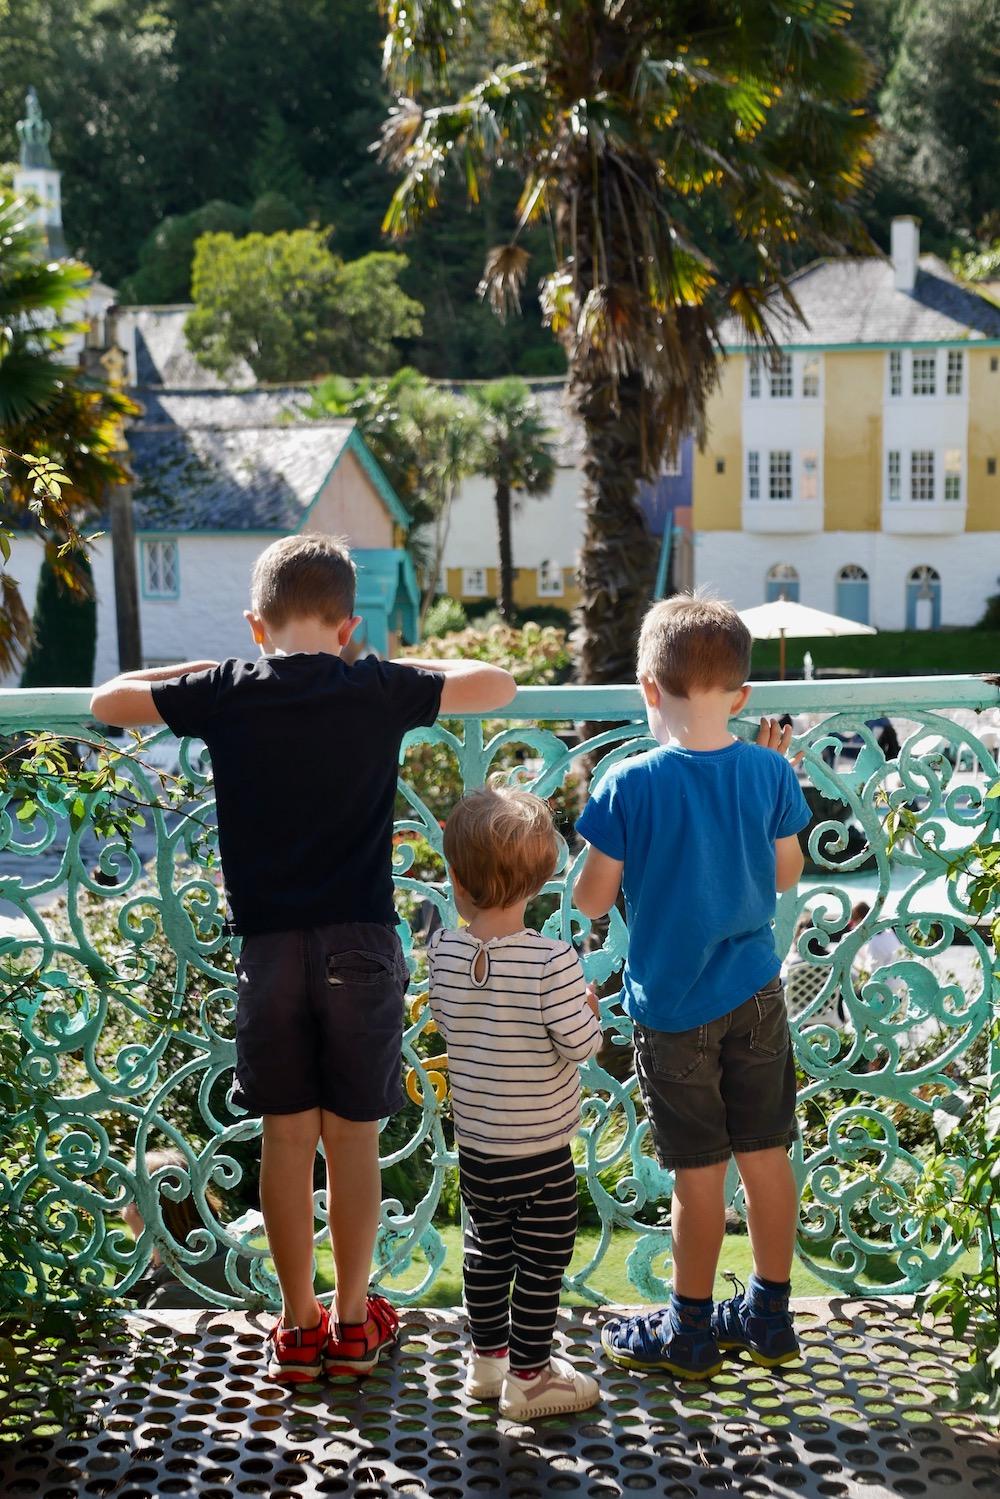 Kids in Portmeirion